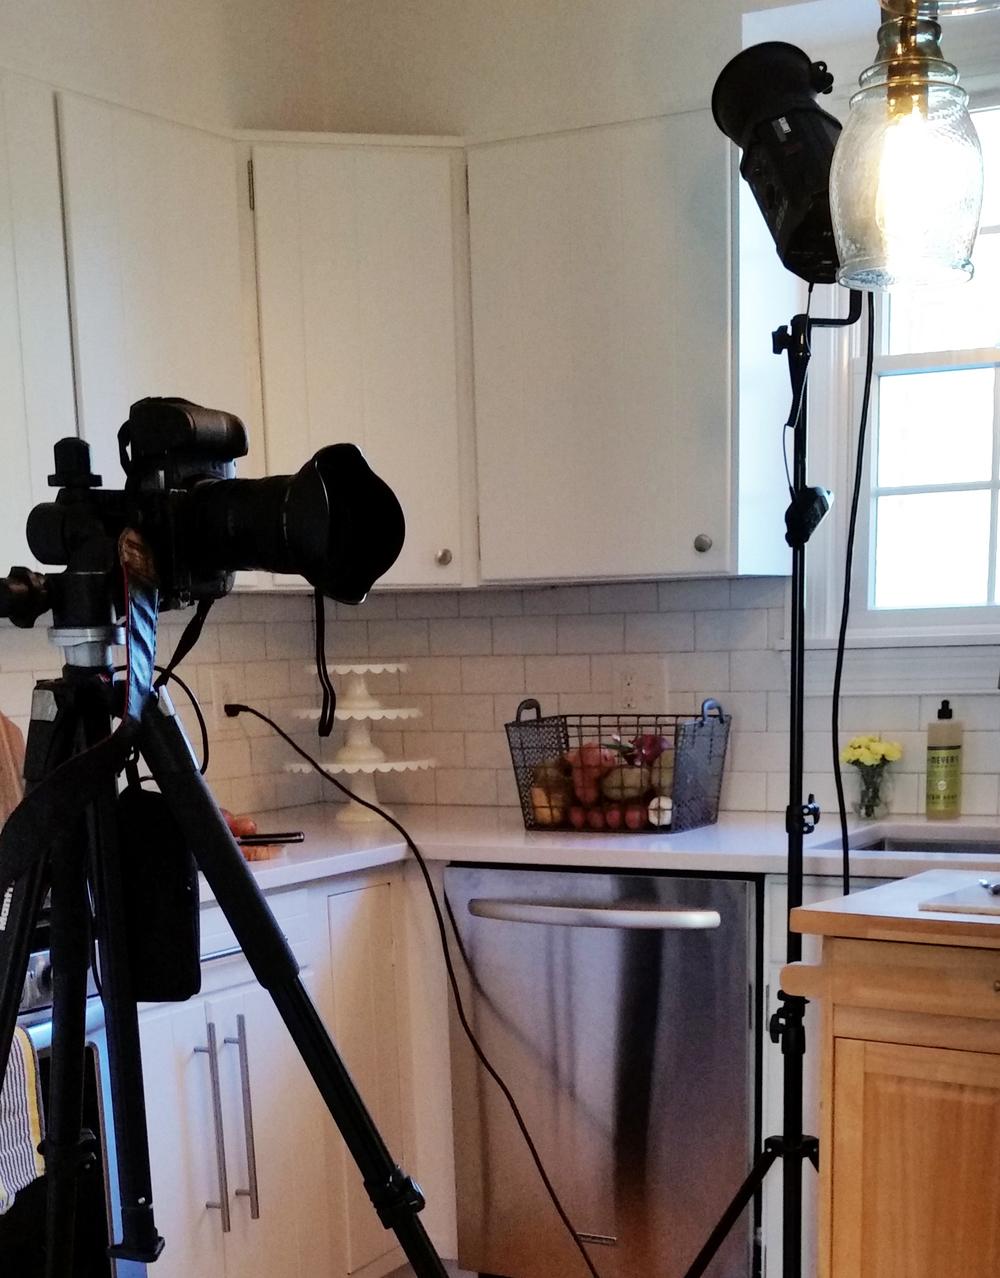 JZID-Behind the scenes-Kitchen-Photo Shoot.jpg